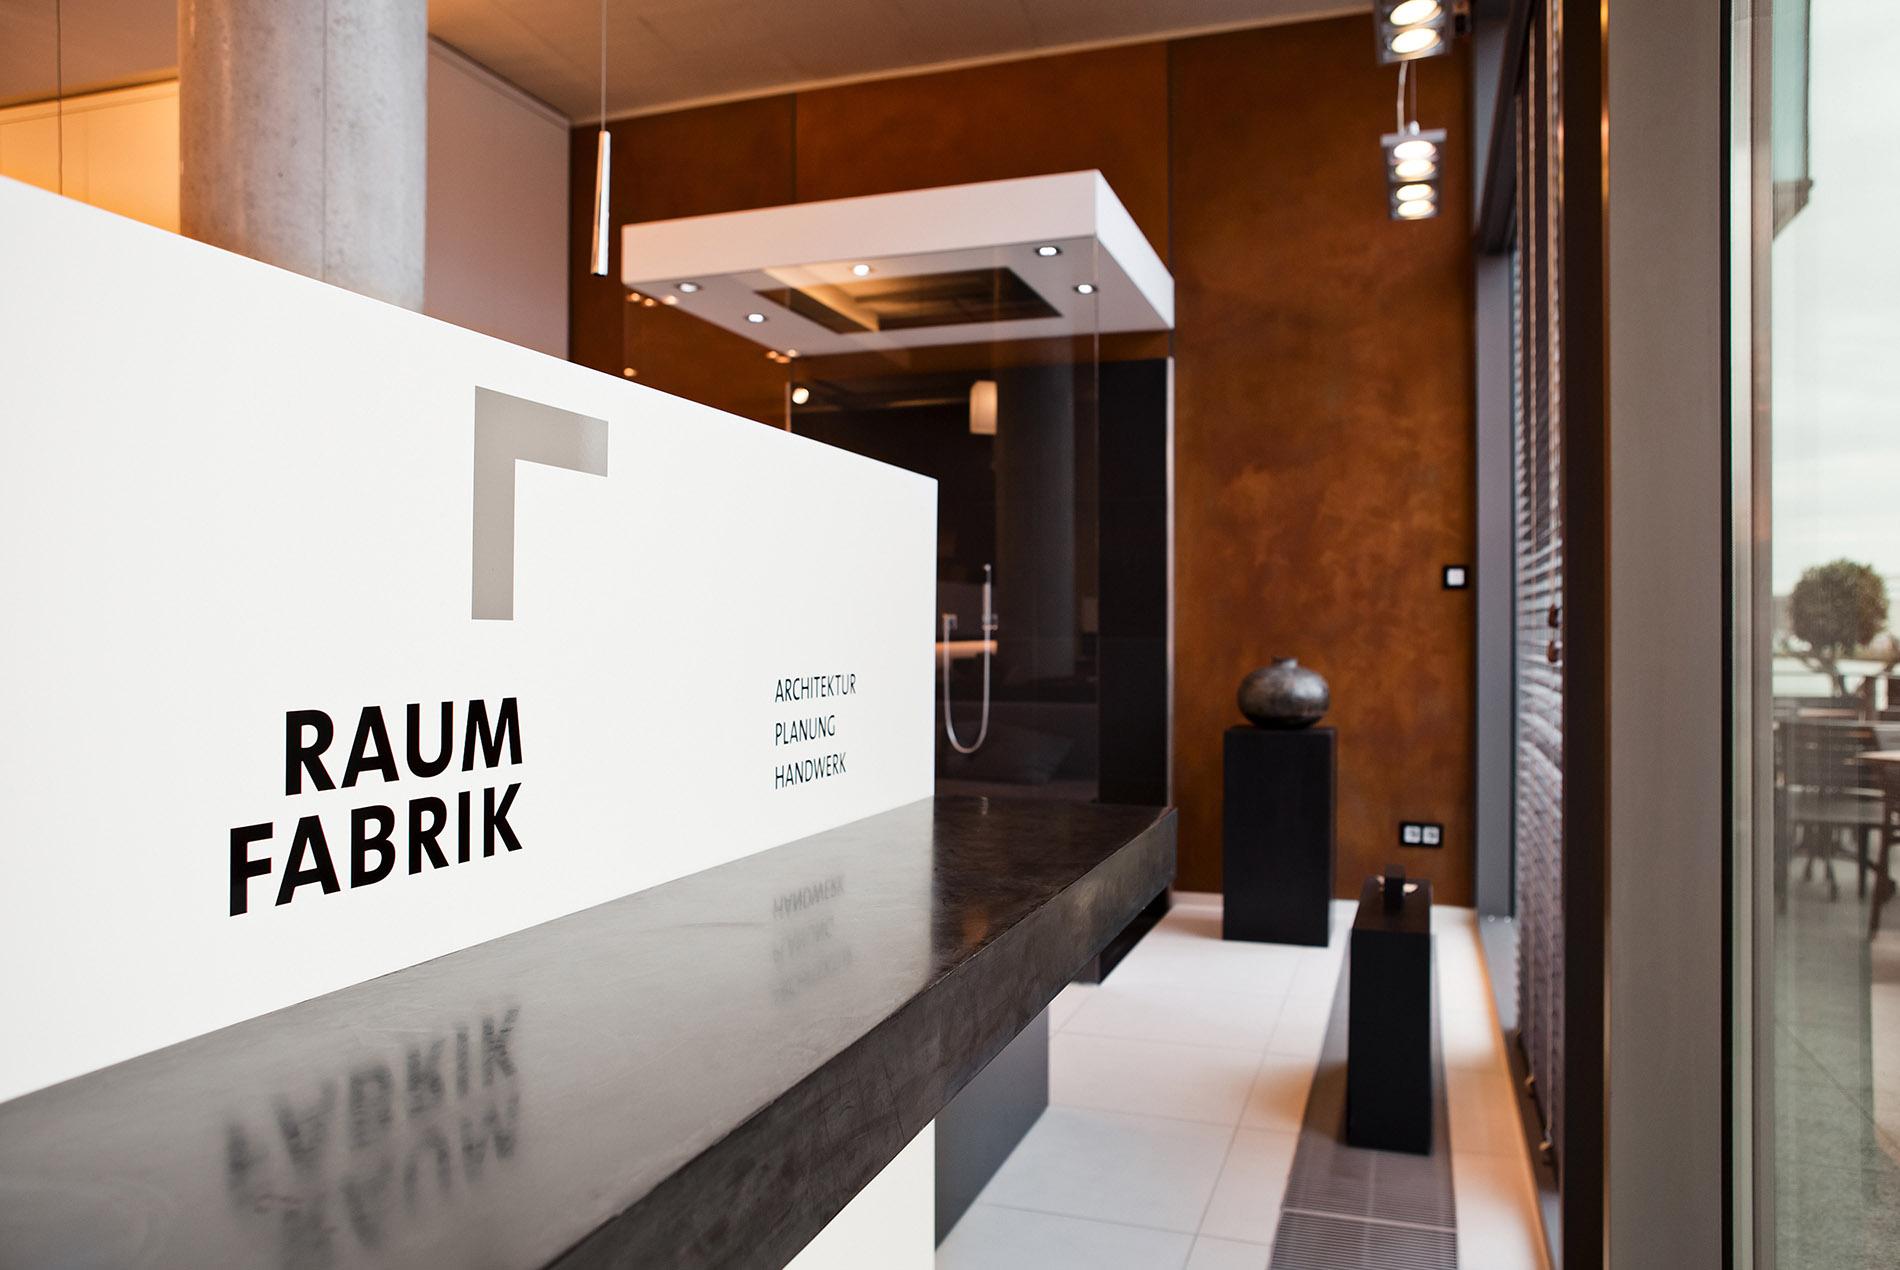 netzwerk raumfabrik sch pker holz wohn form gmbh co kg. Black Bedroom Furniture Sets. Home Design Ideas